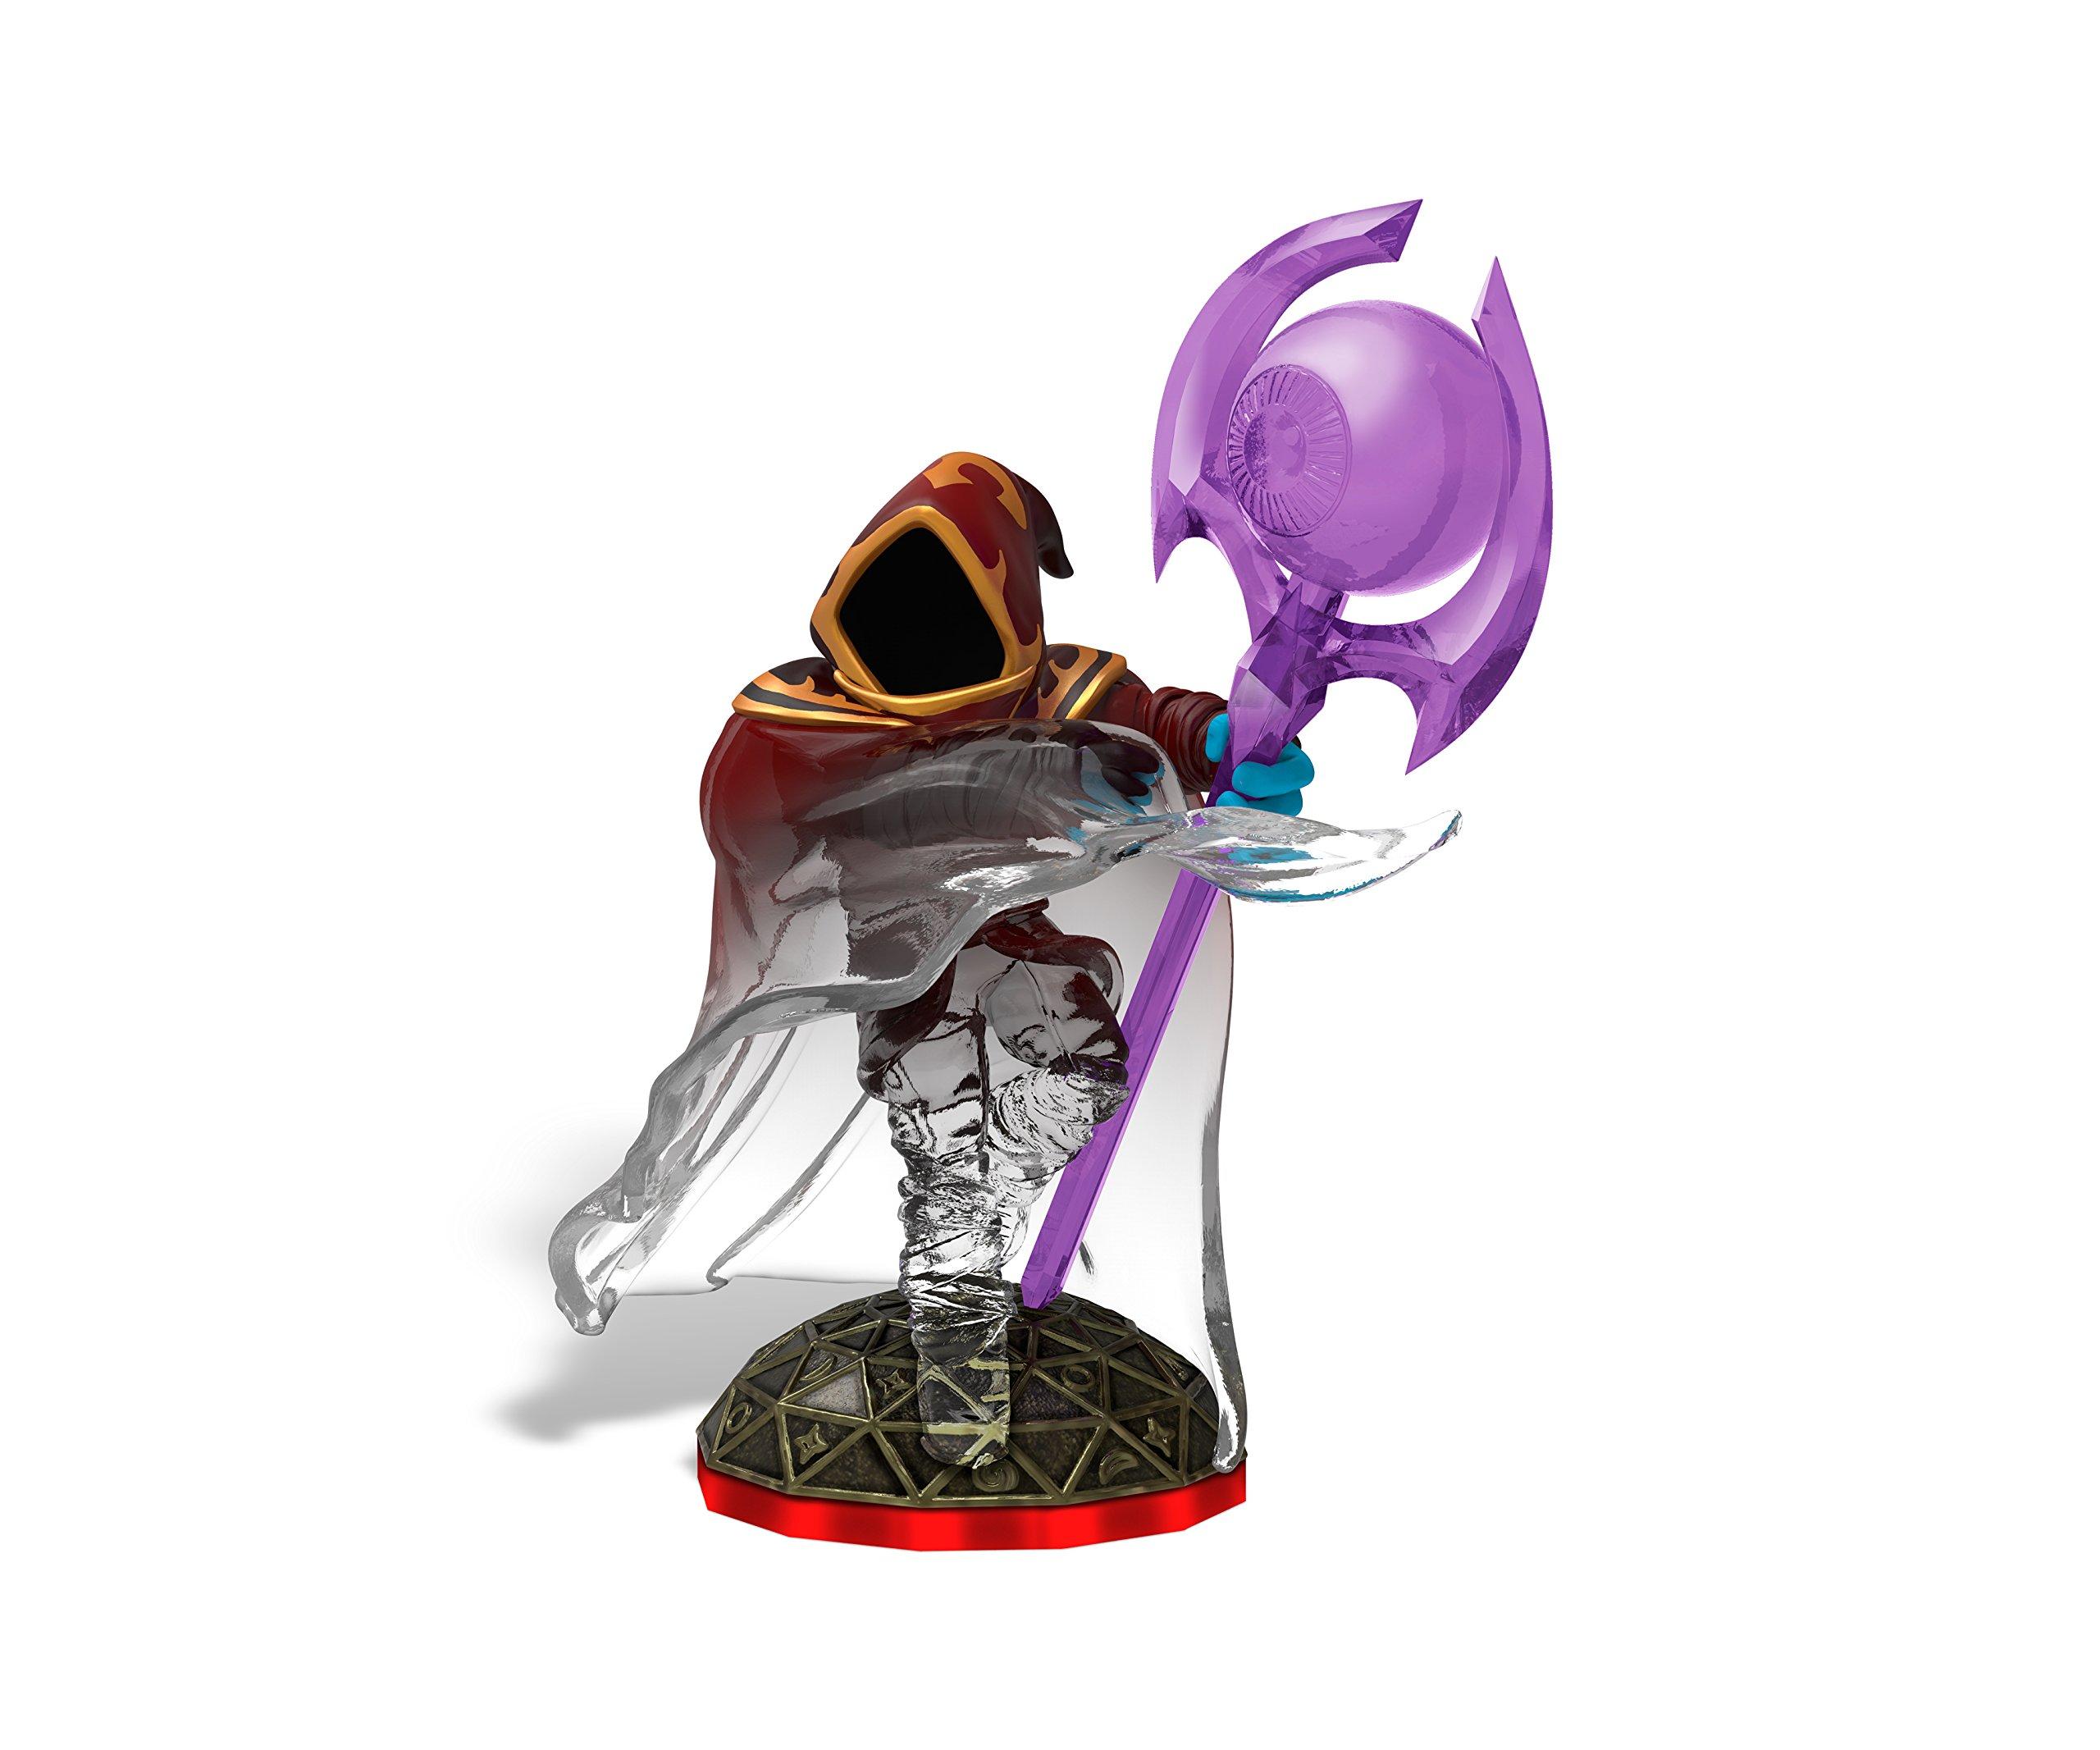 Skylanders Trap Team: Trap Master Enigma Character